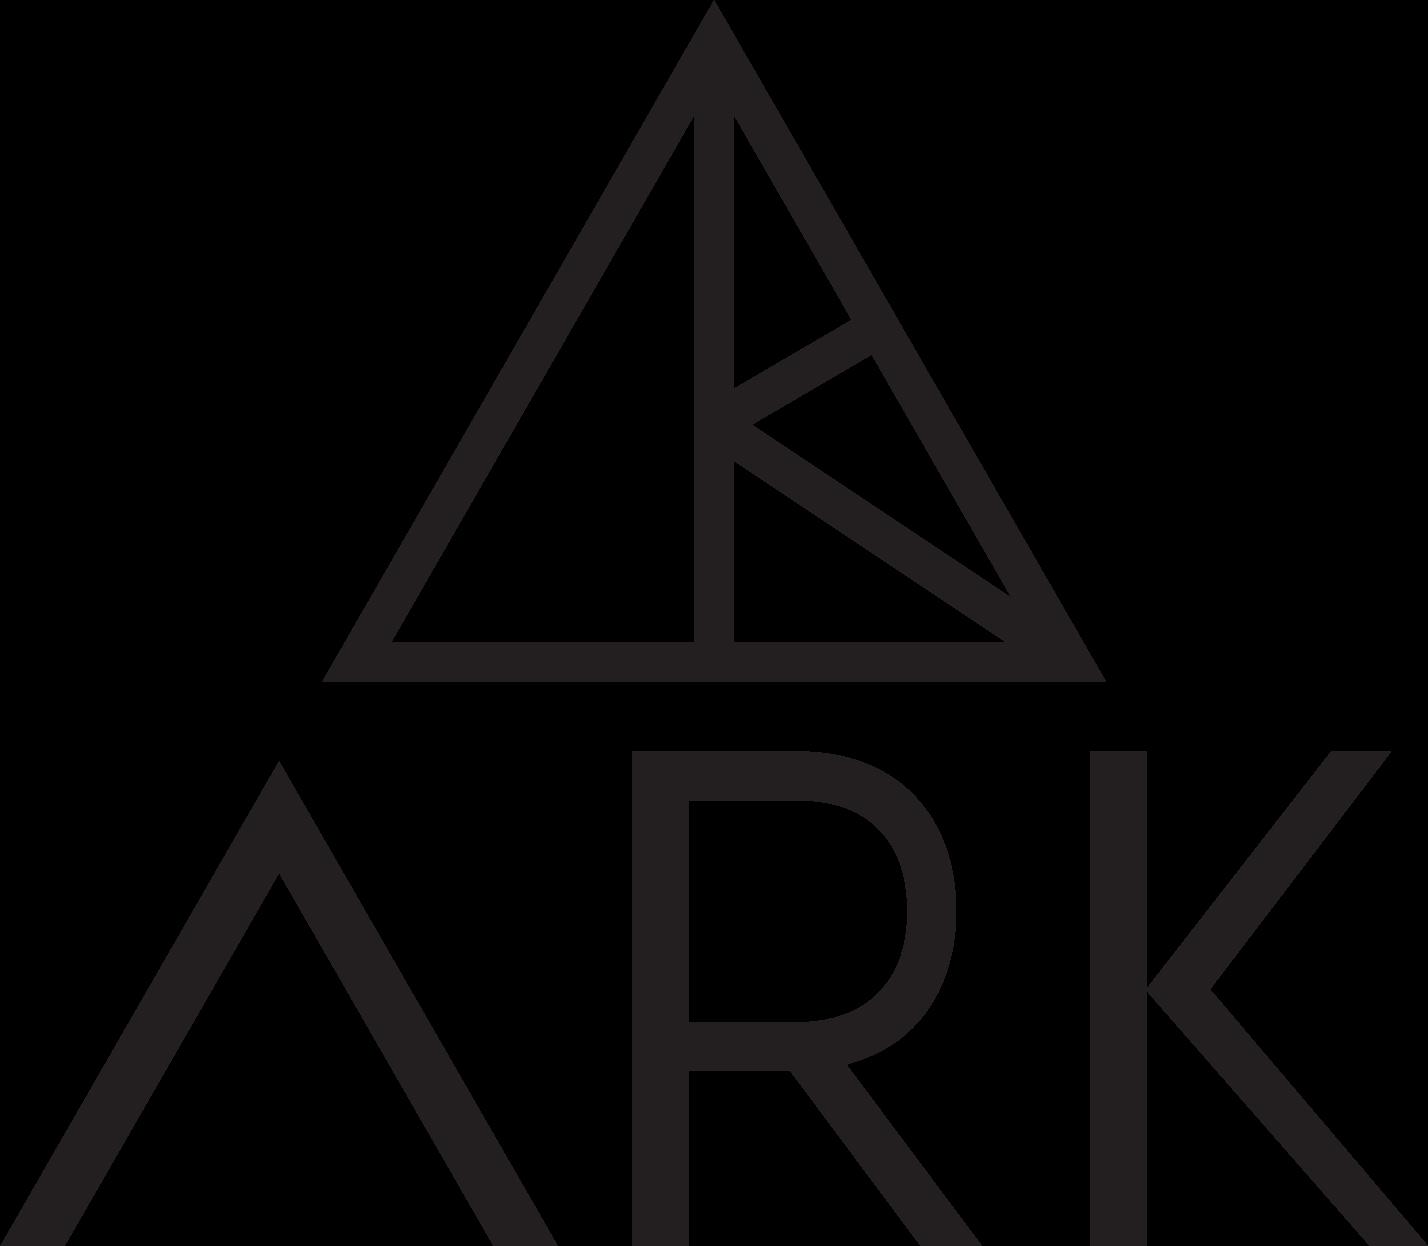 ARK Crystal logo